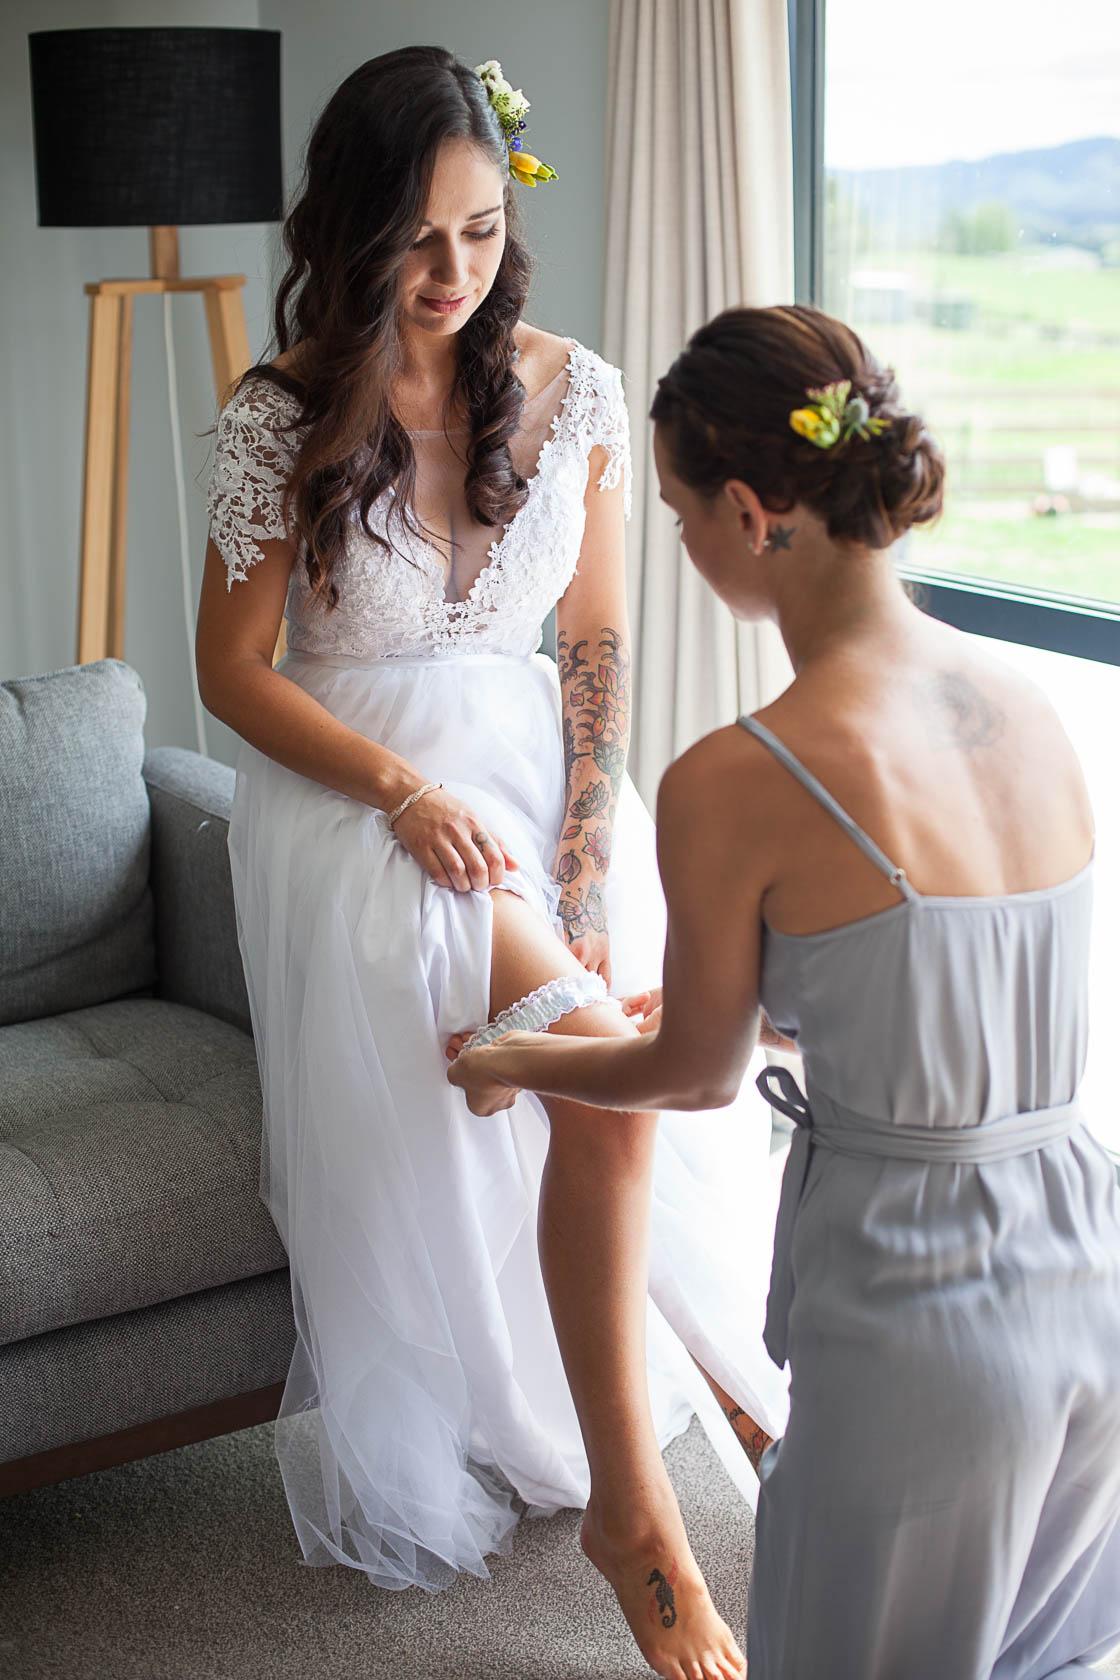 Matakana-wedding-auckland5716.jpg